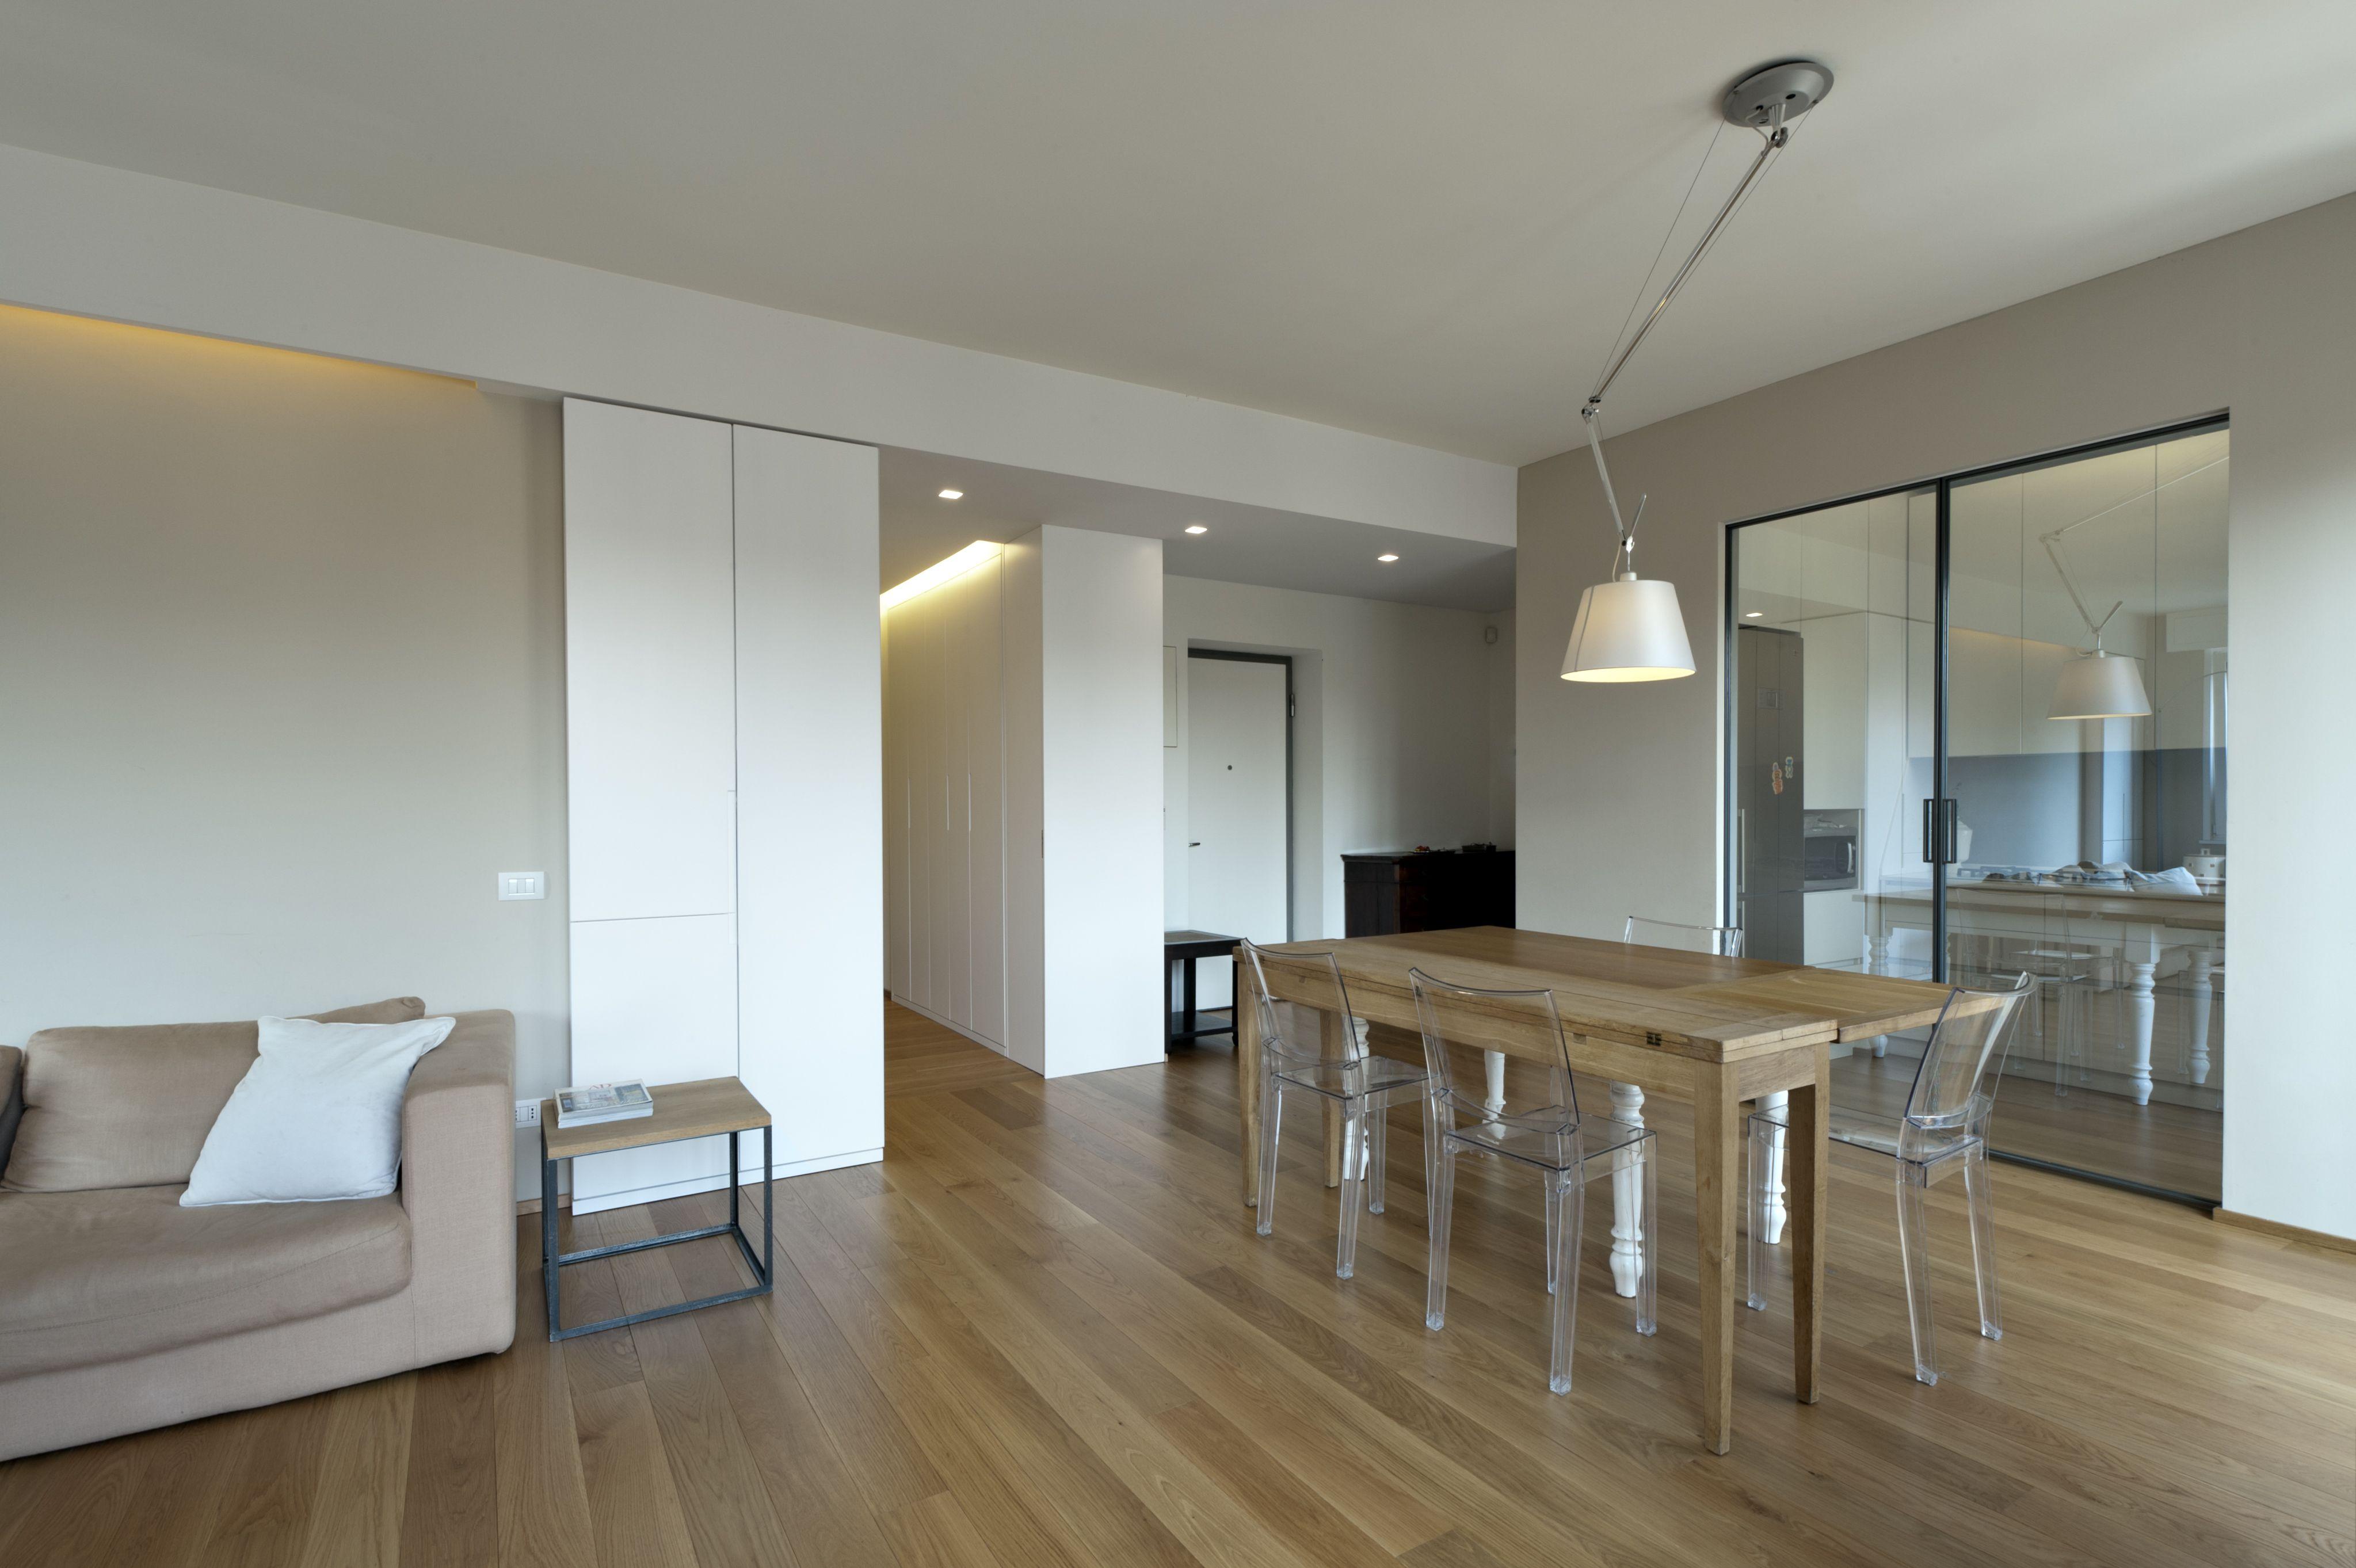 Living Room Interior Tables Soggiorno Tavoli Interno